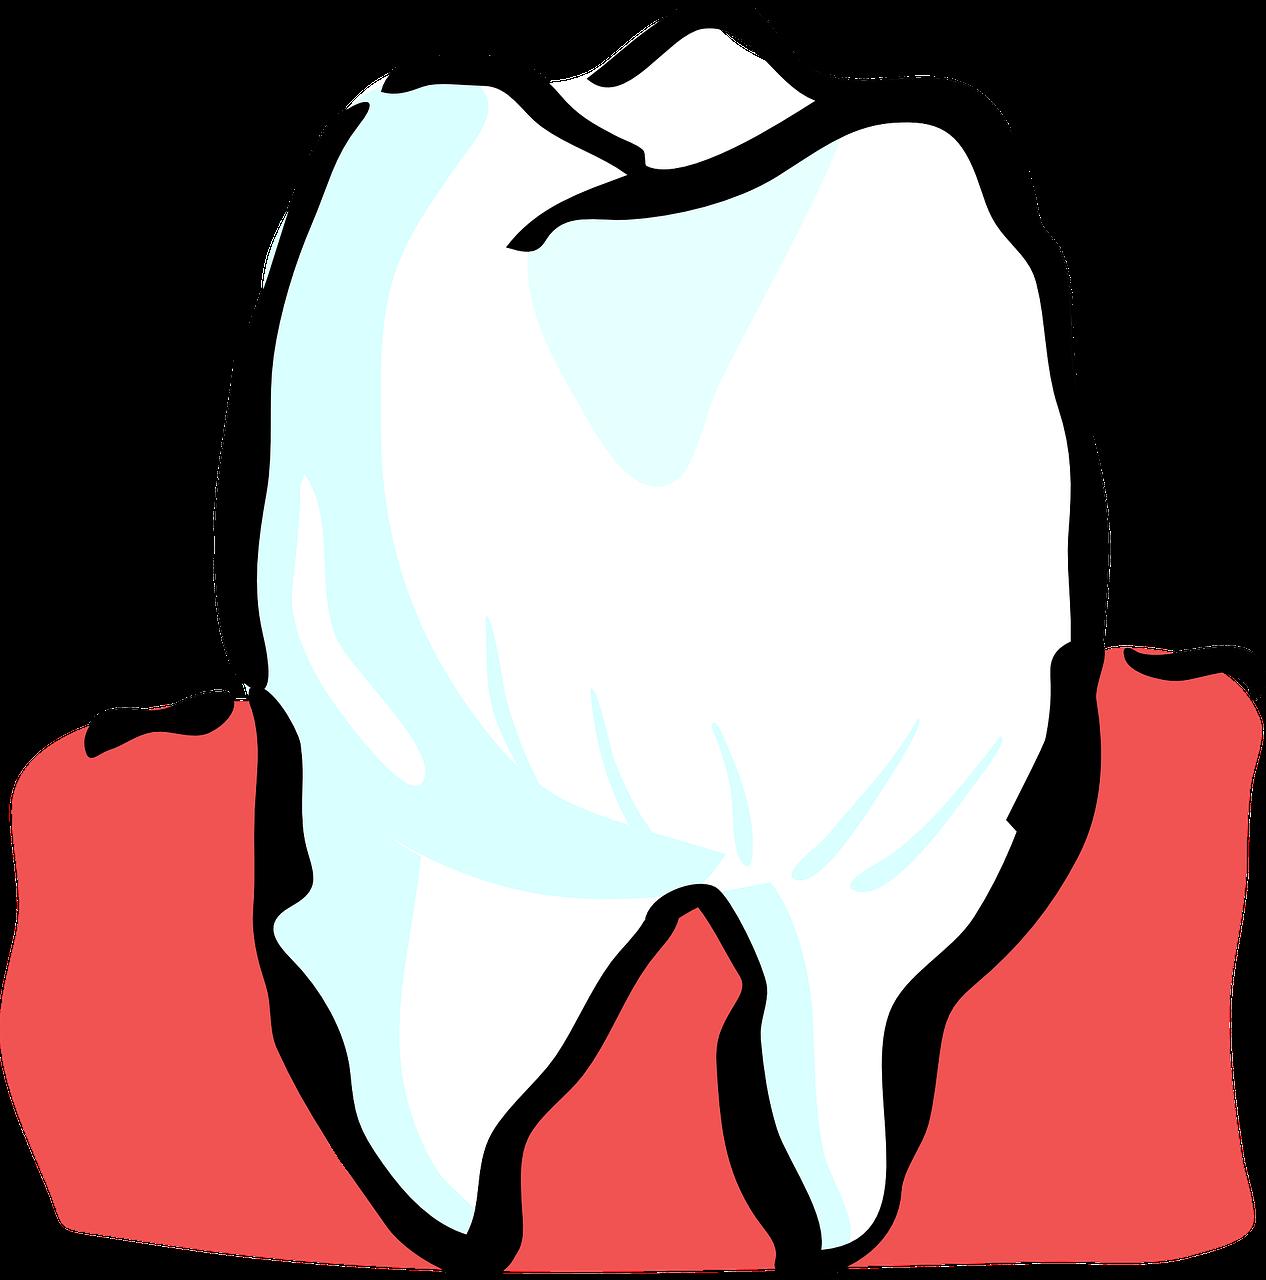 Tandartspraktijk Kies - Precies bang voor tandarts